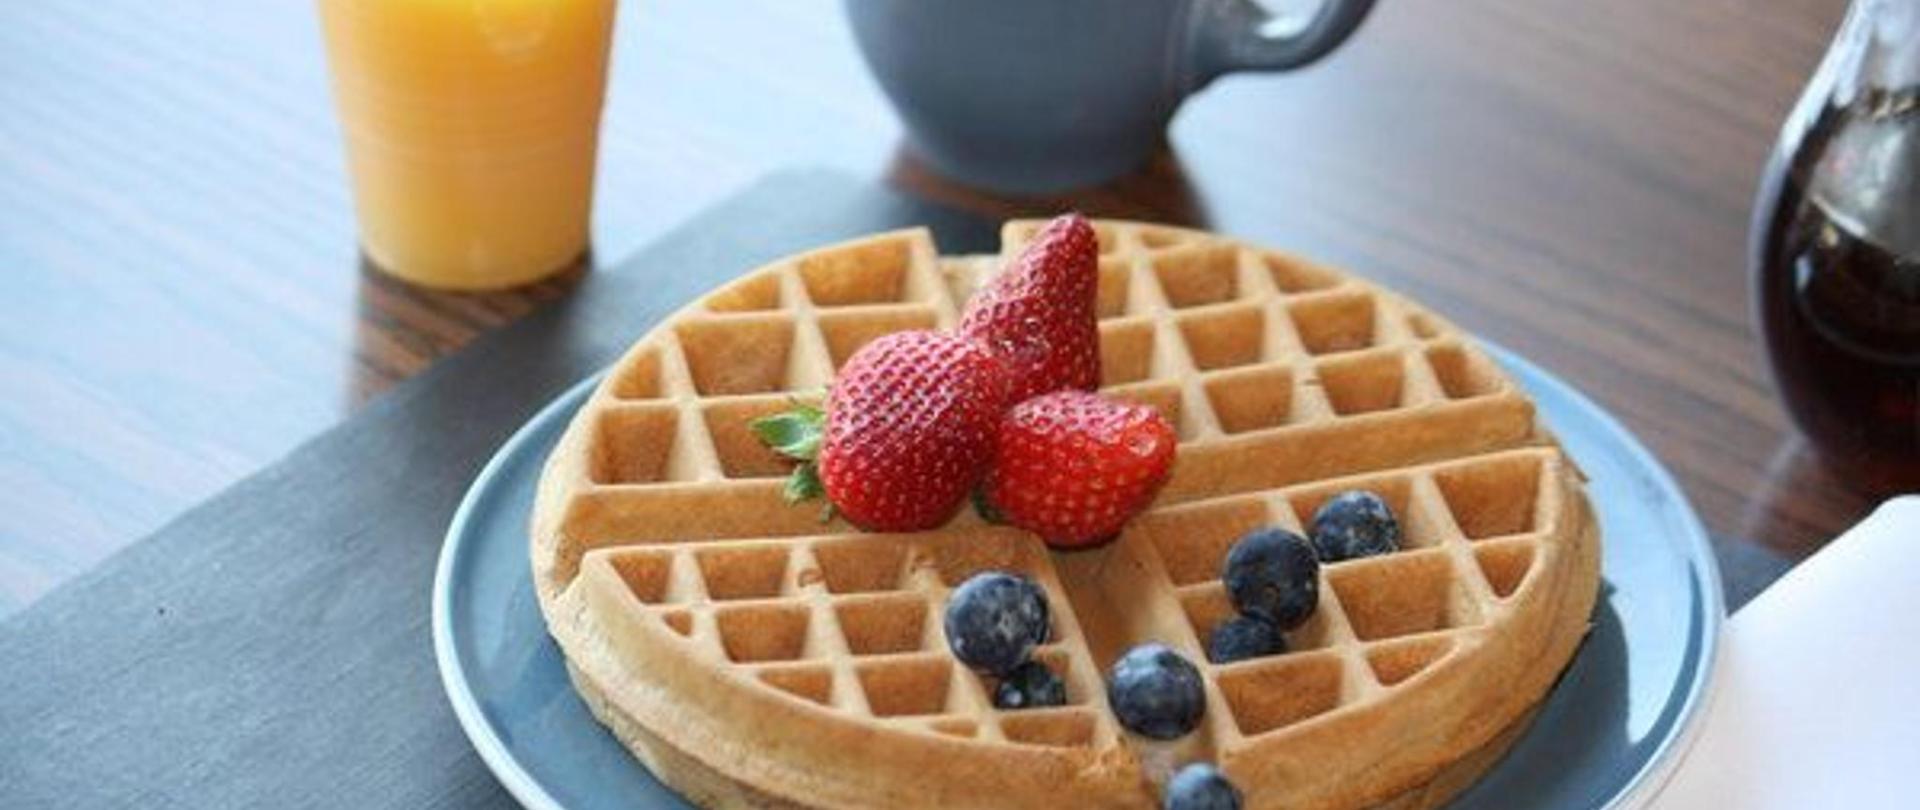 59888794_delicious_waffles_.jpg